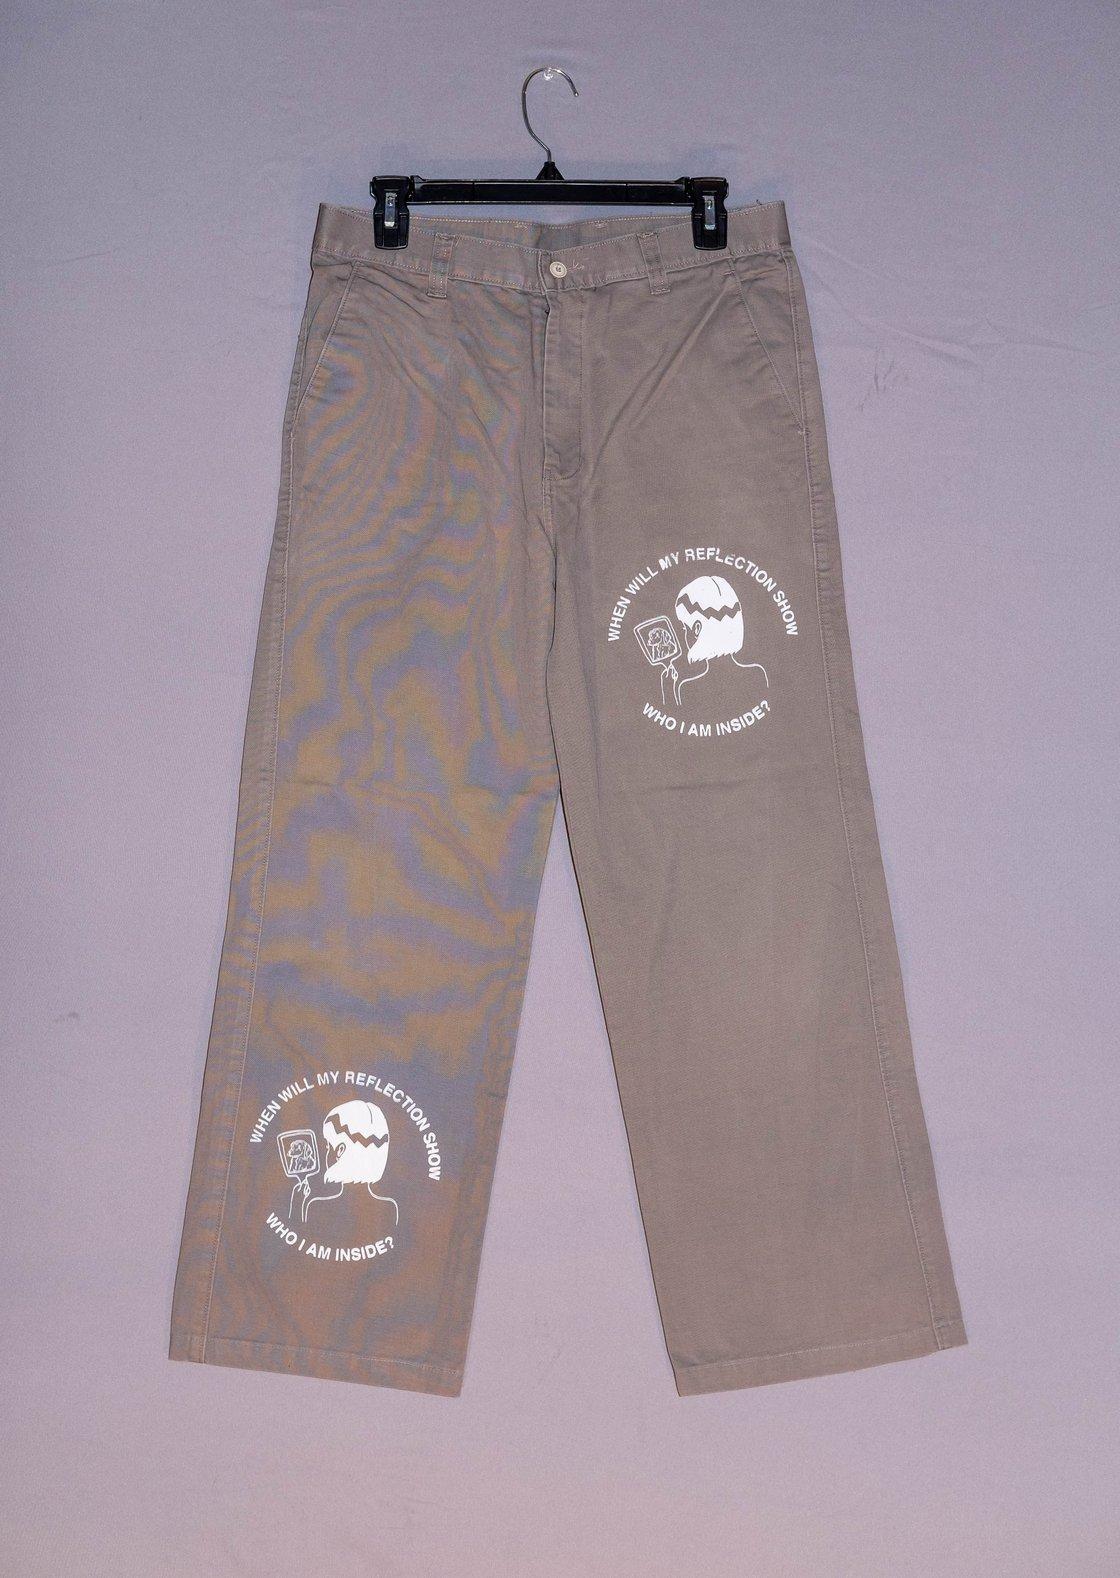 Image of Self Reflection Pants